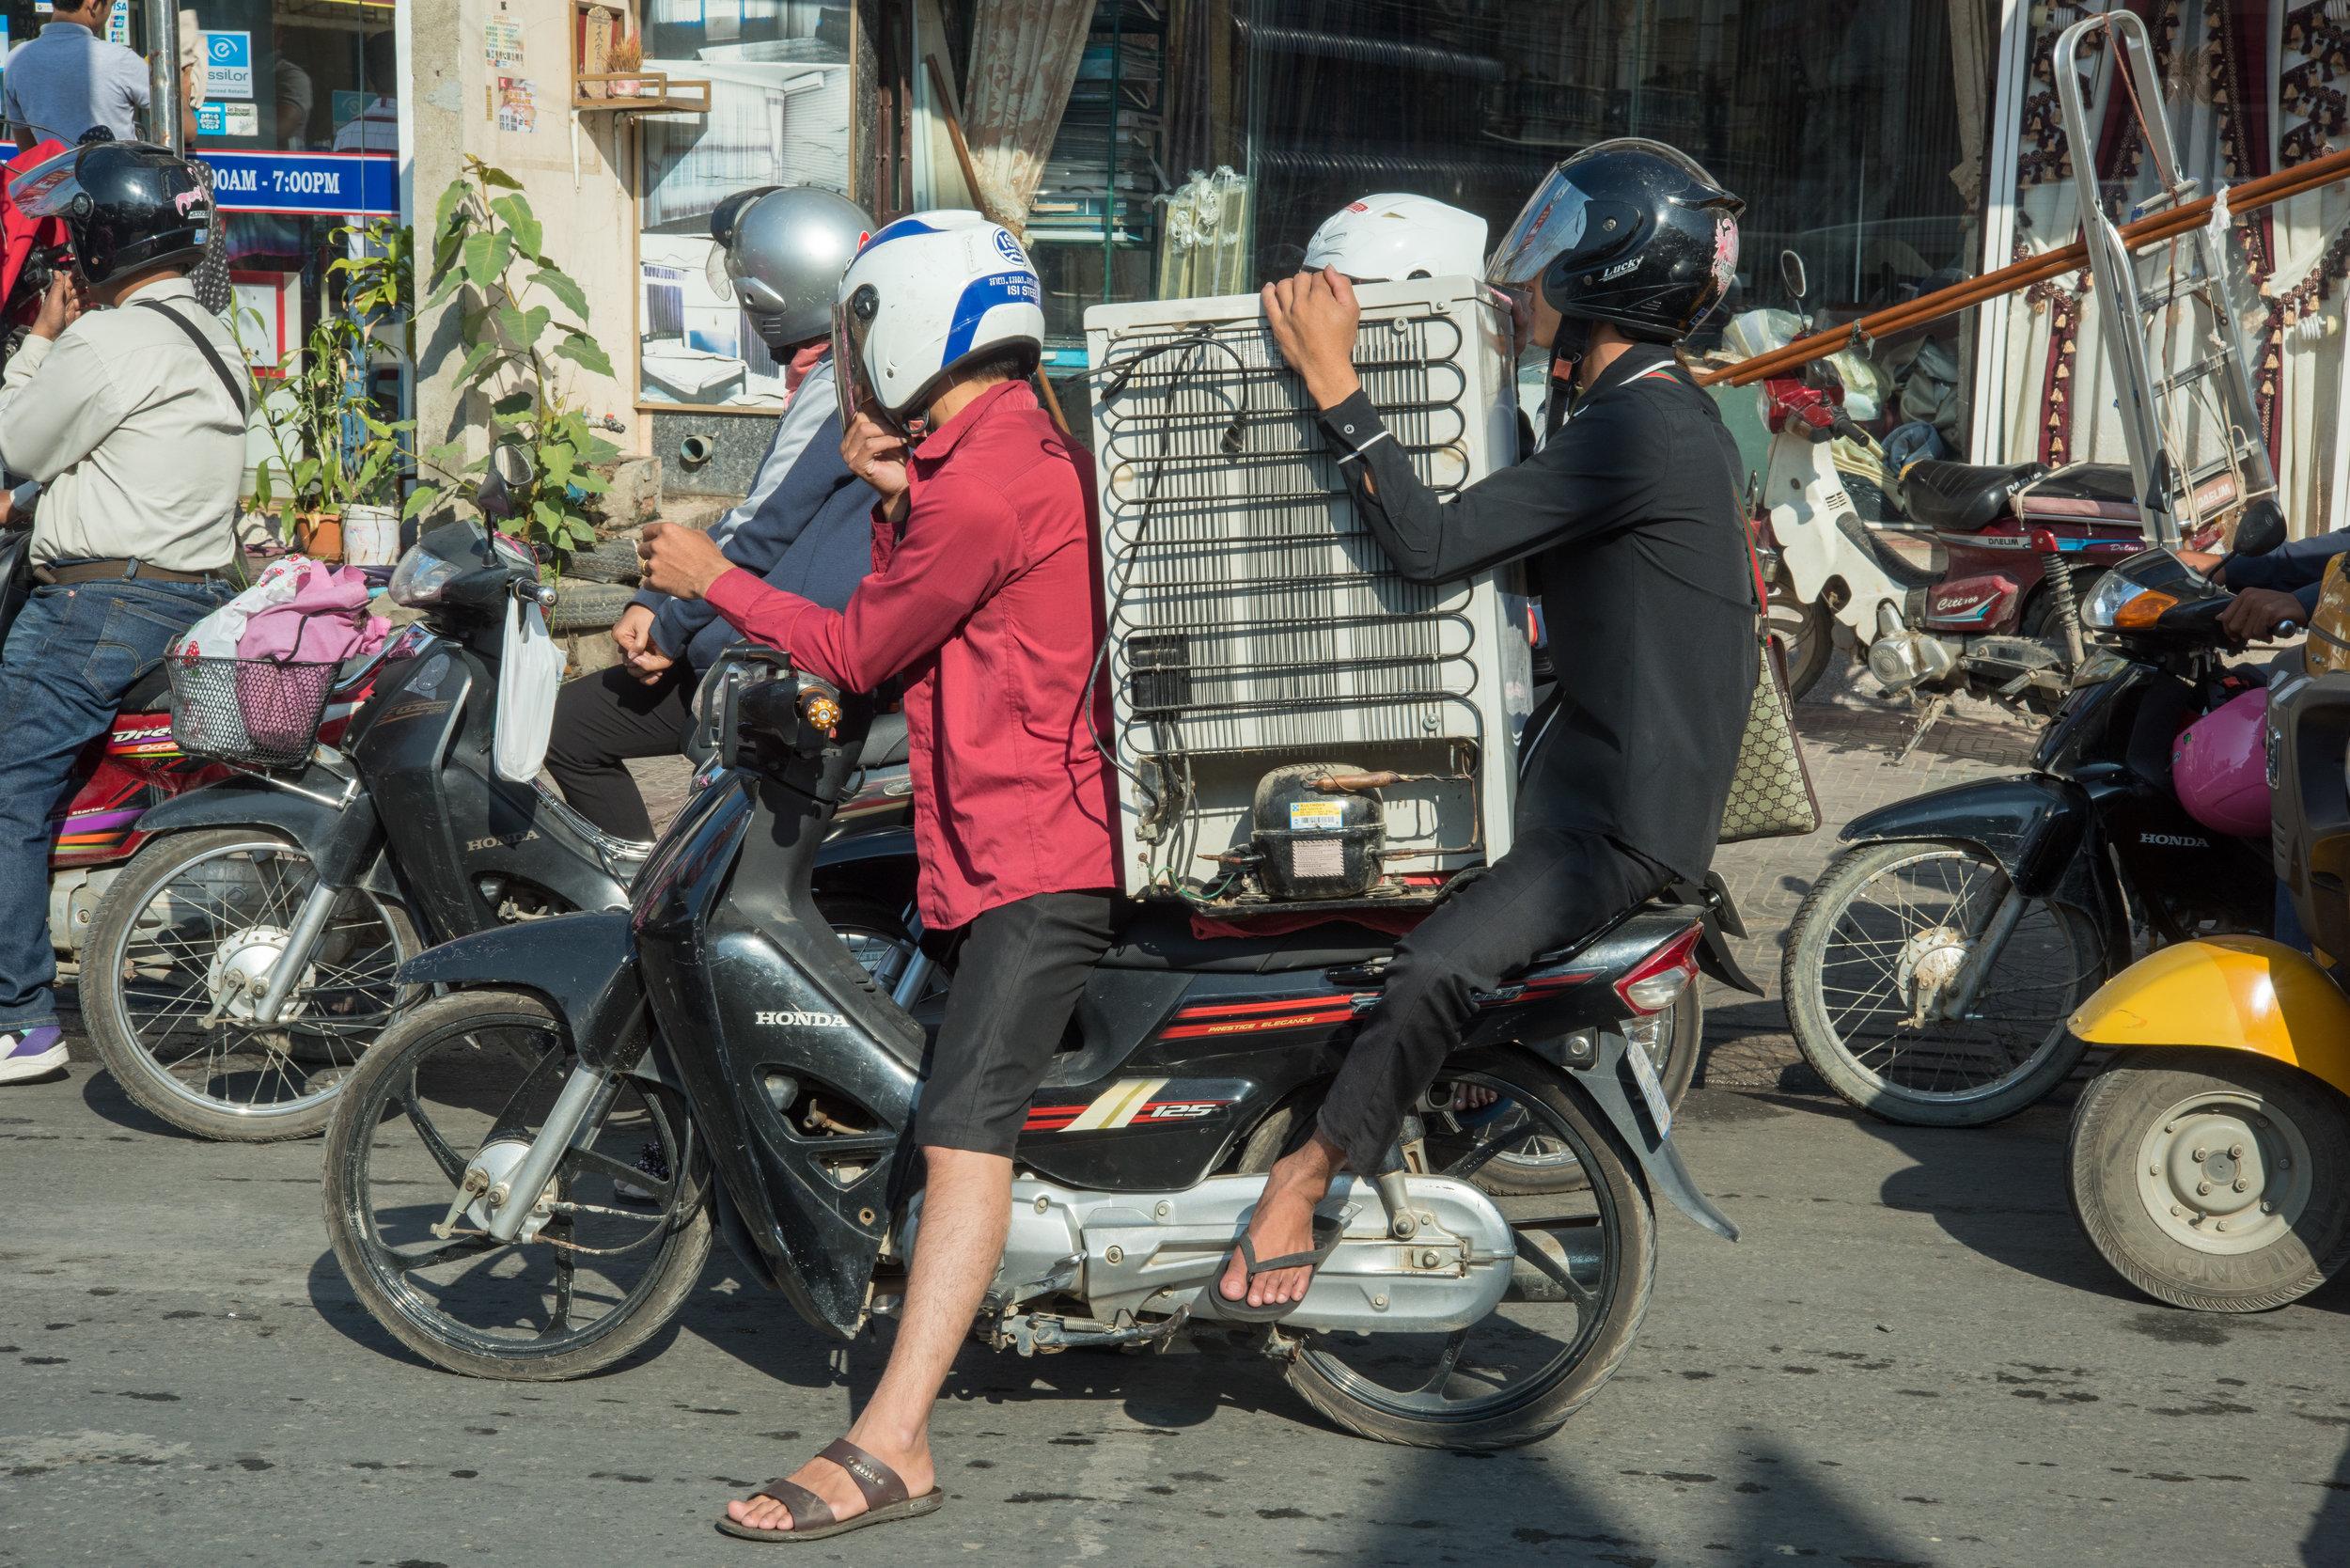 Motorbike transporting bar fridge, Phnom Penh, Cambodia